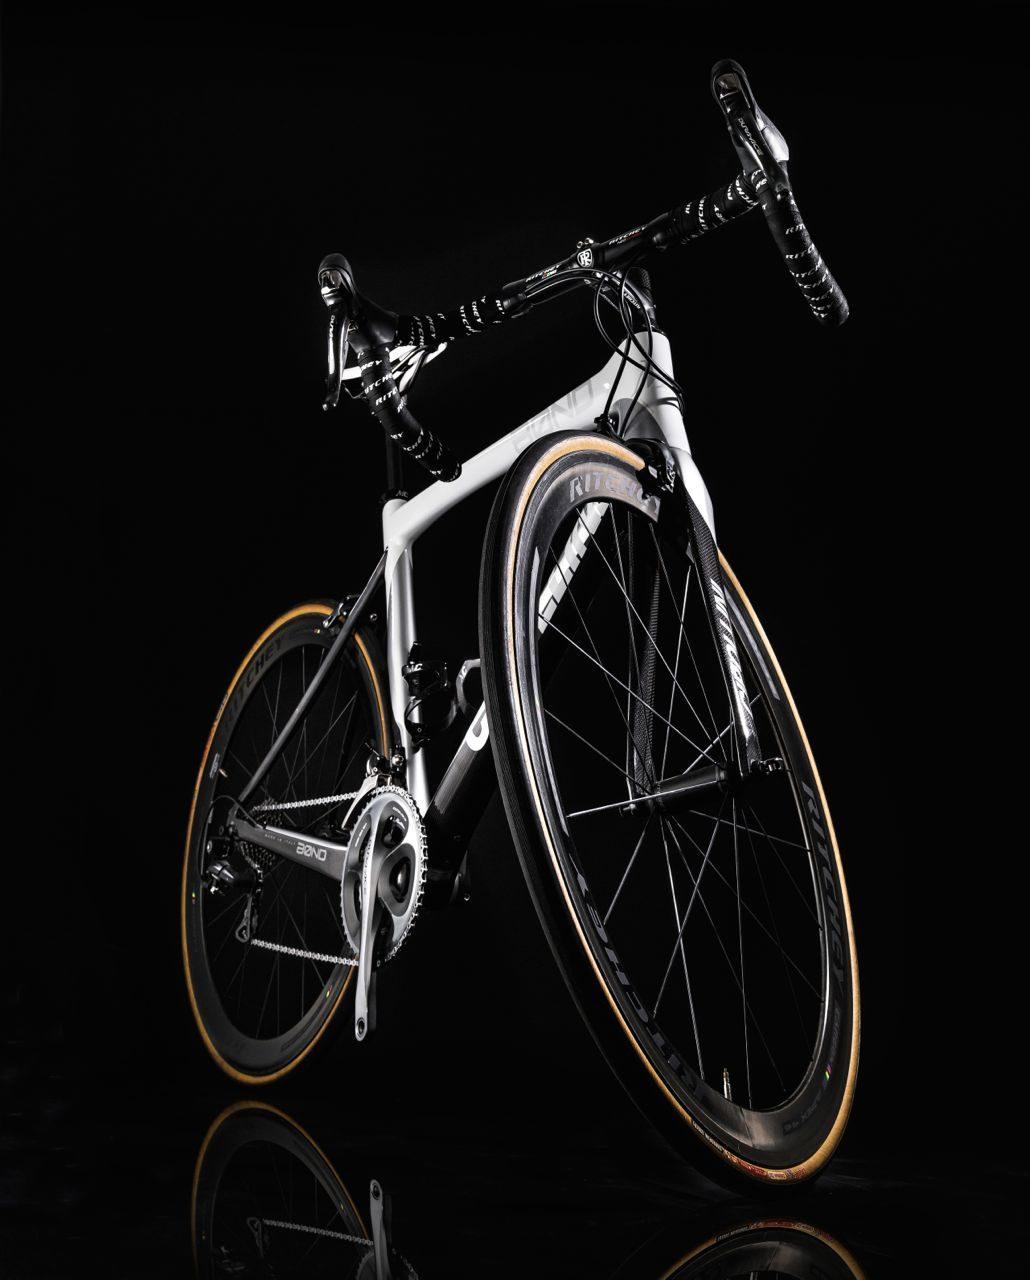 Cipollini Bond road bike